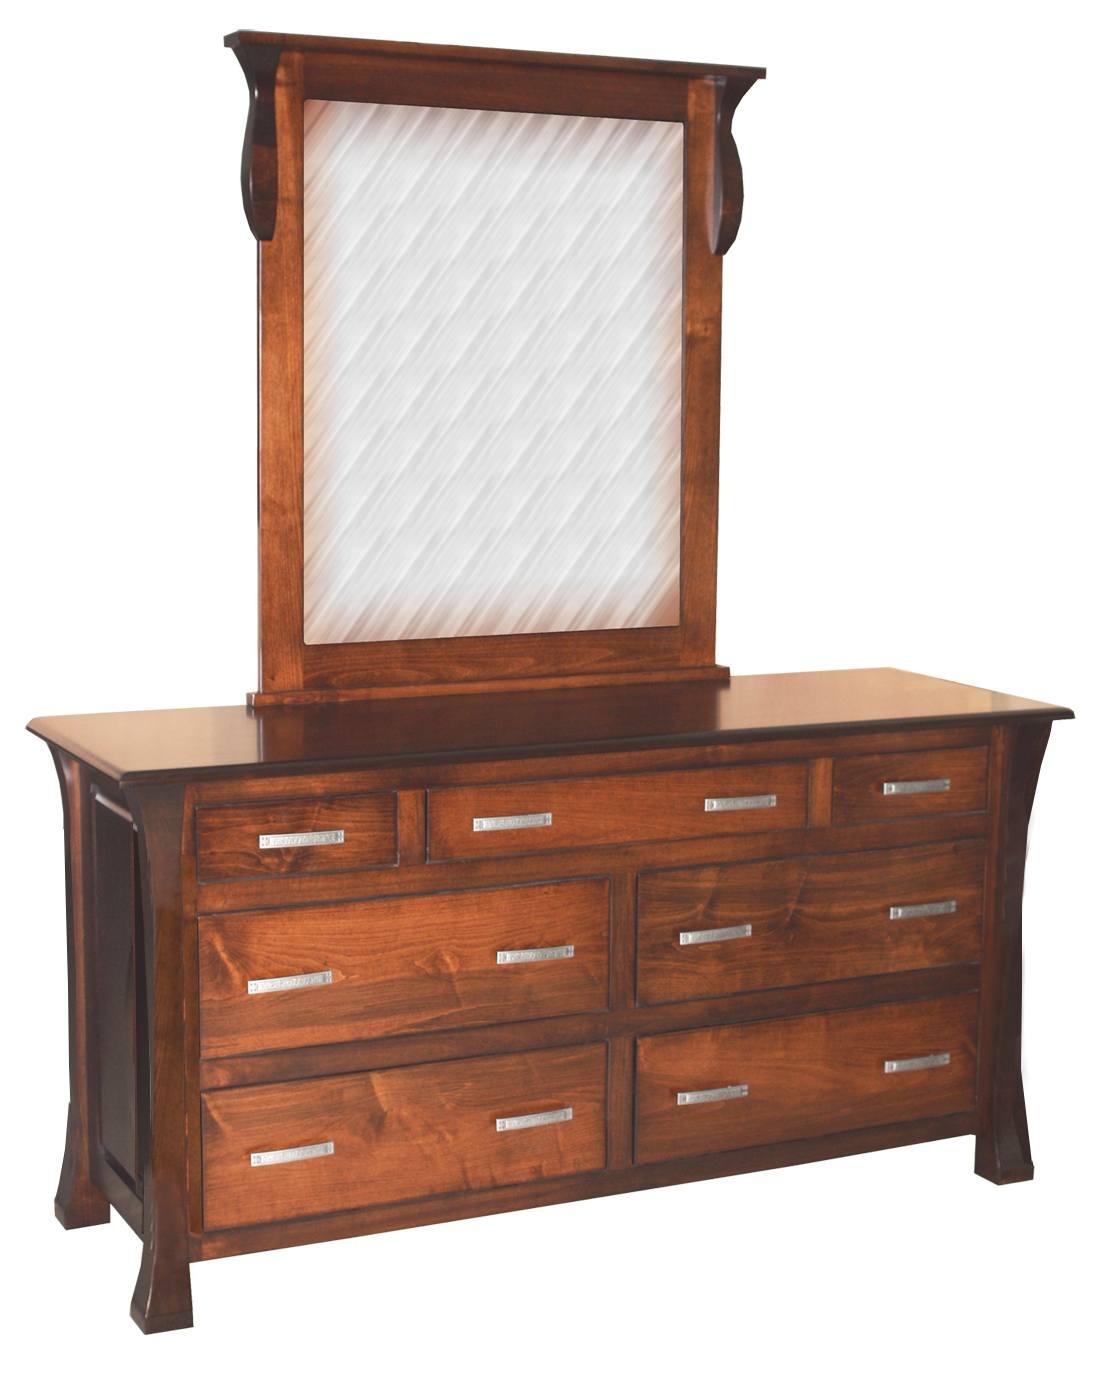 Vandalia 7 Drawer Dresser and Mirror